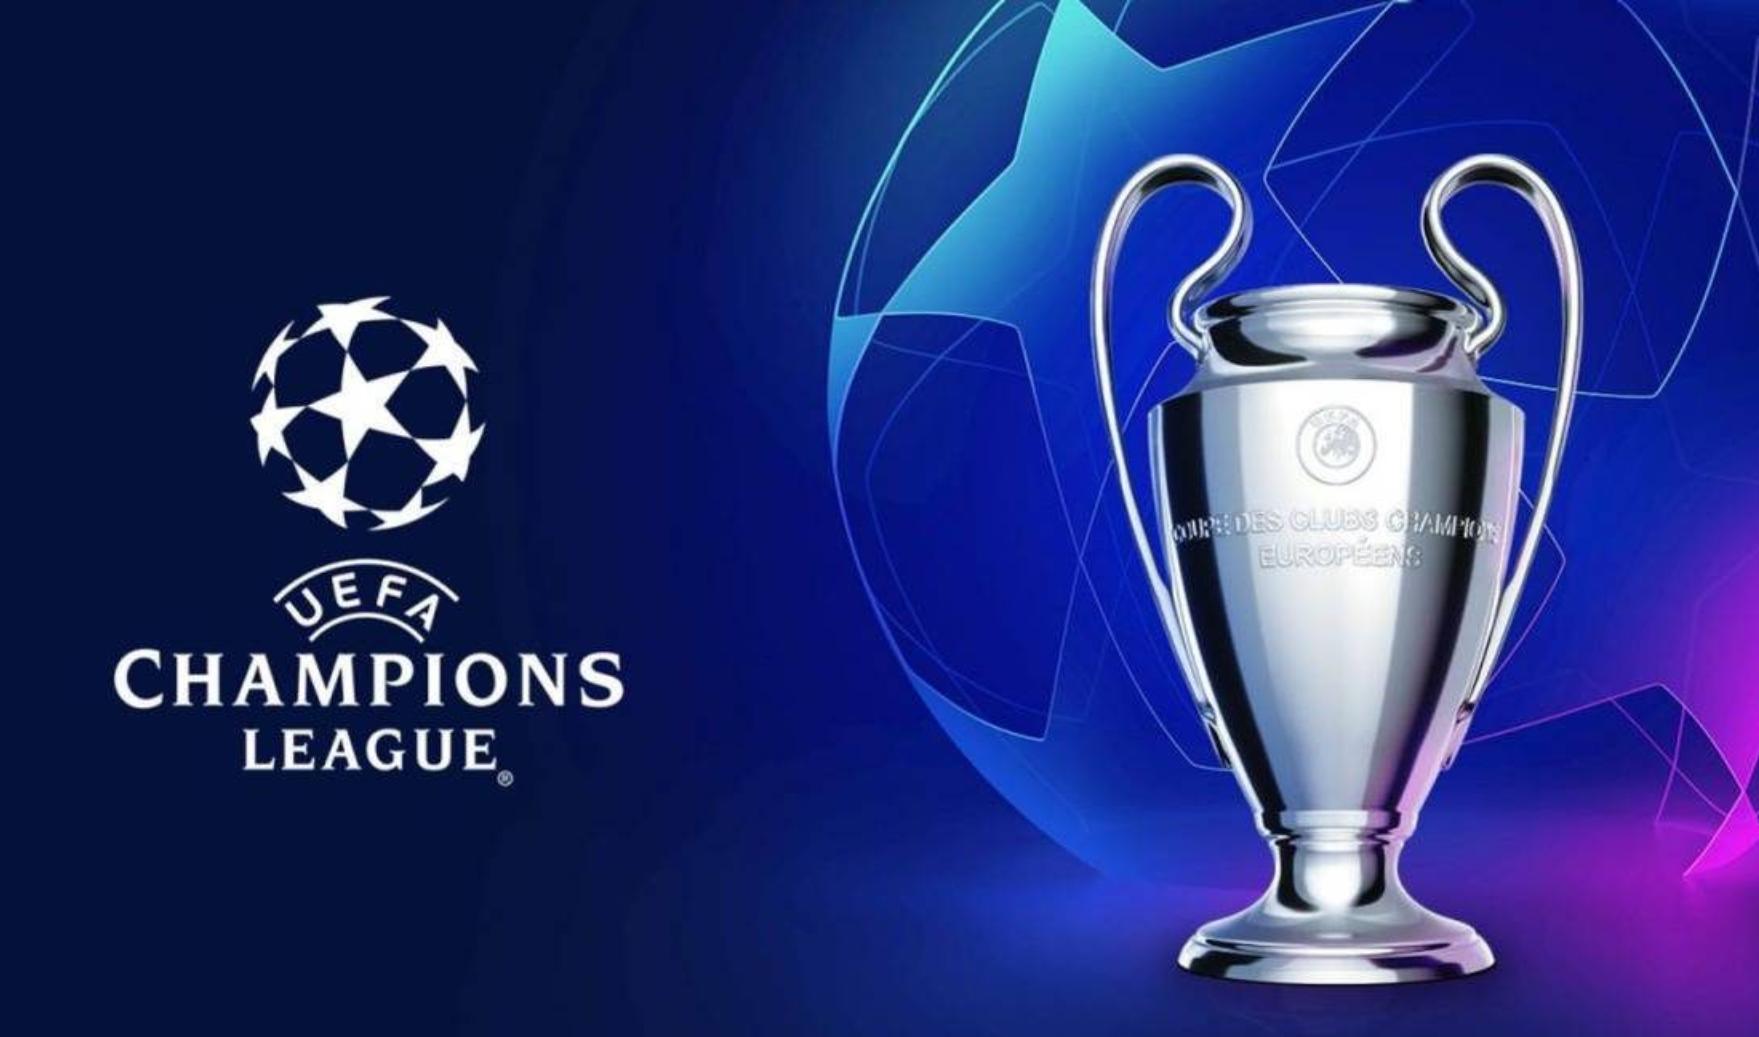 Hasil Pertandingan Liga Champions tadi malam (28/10/2020)